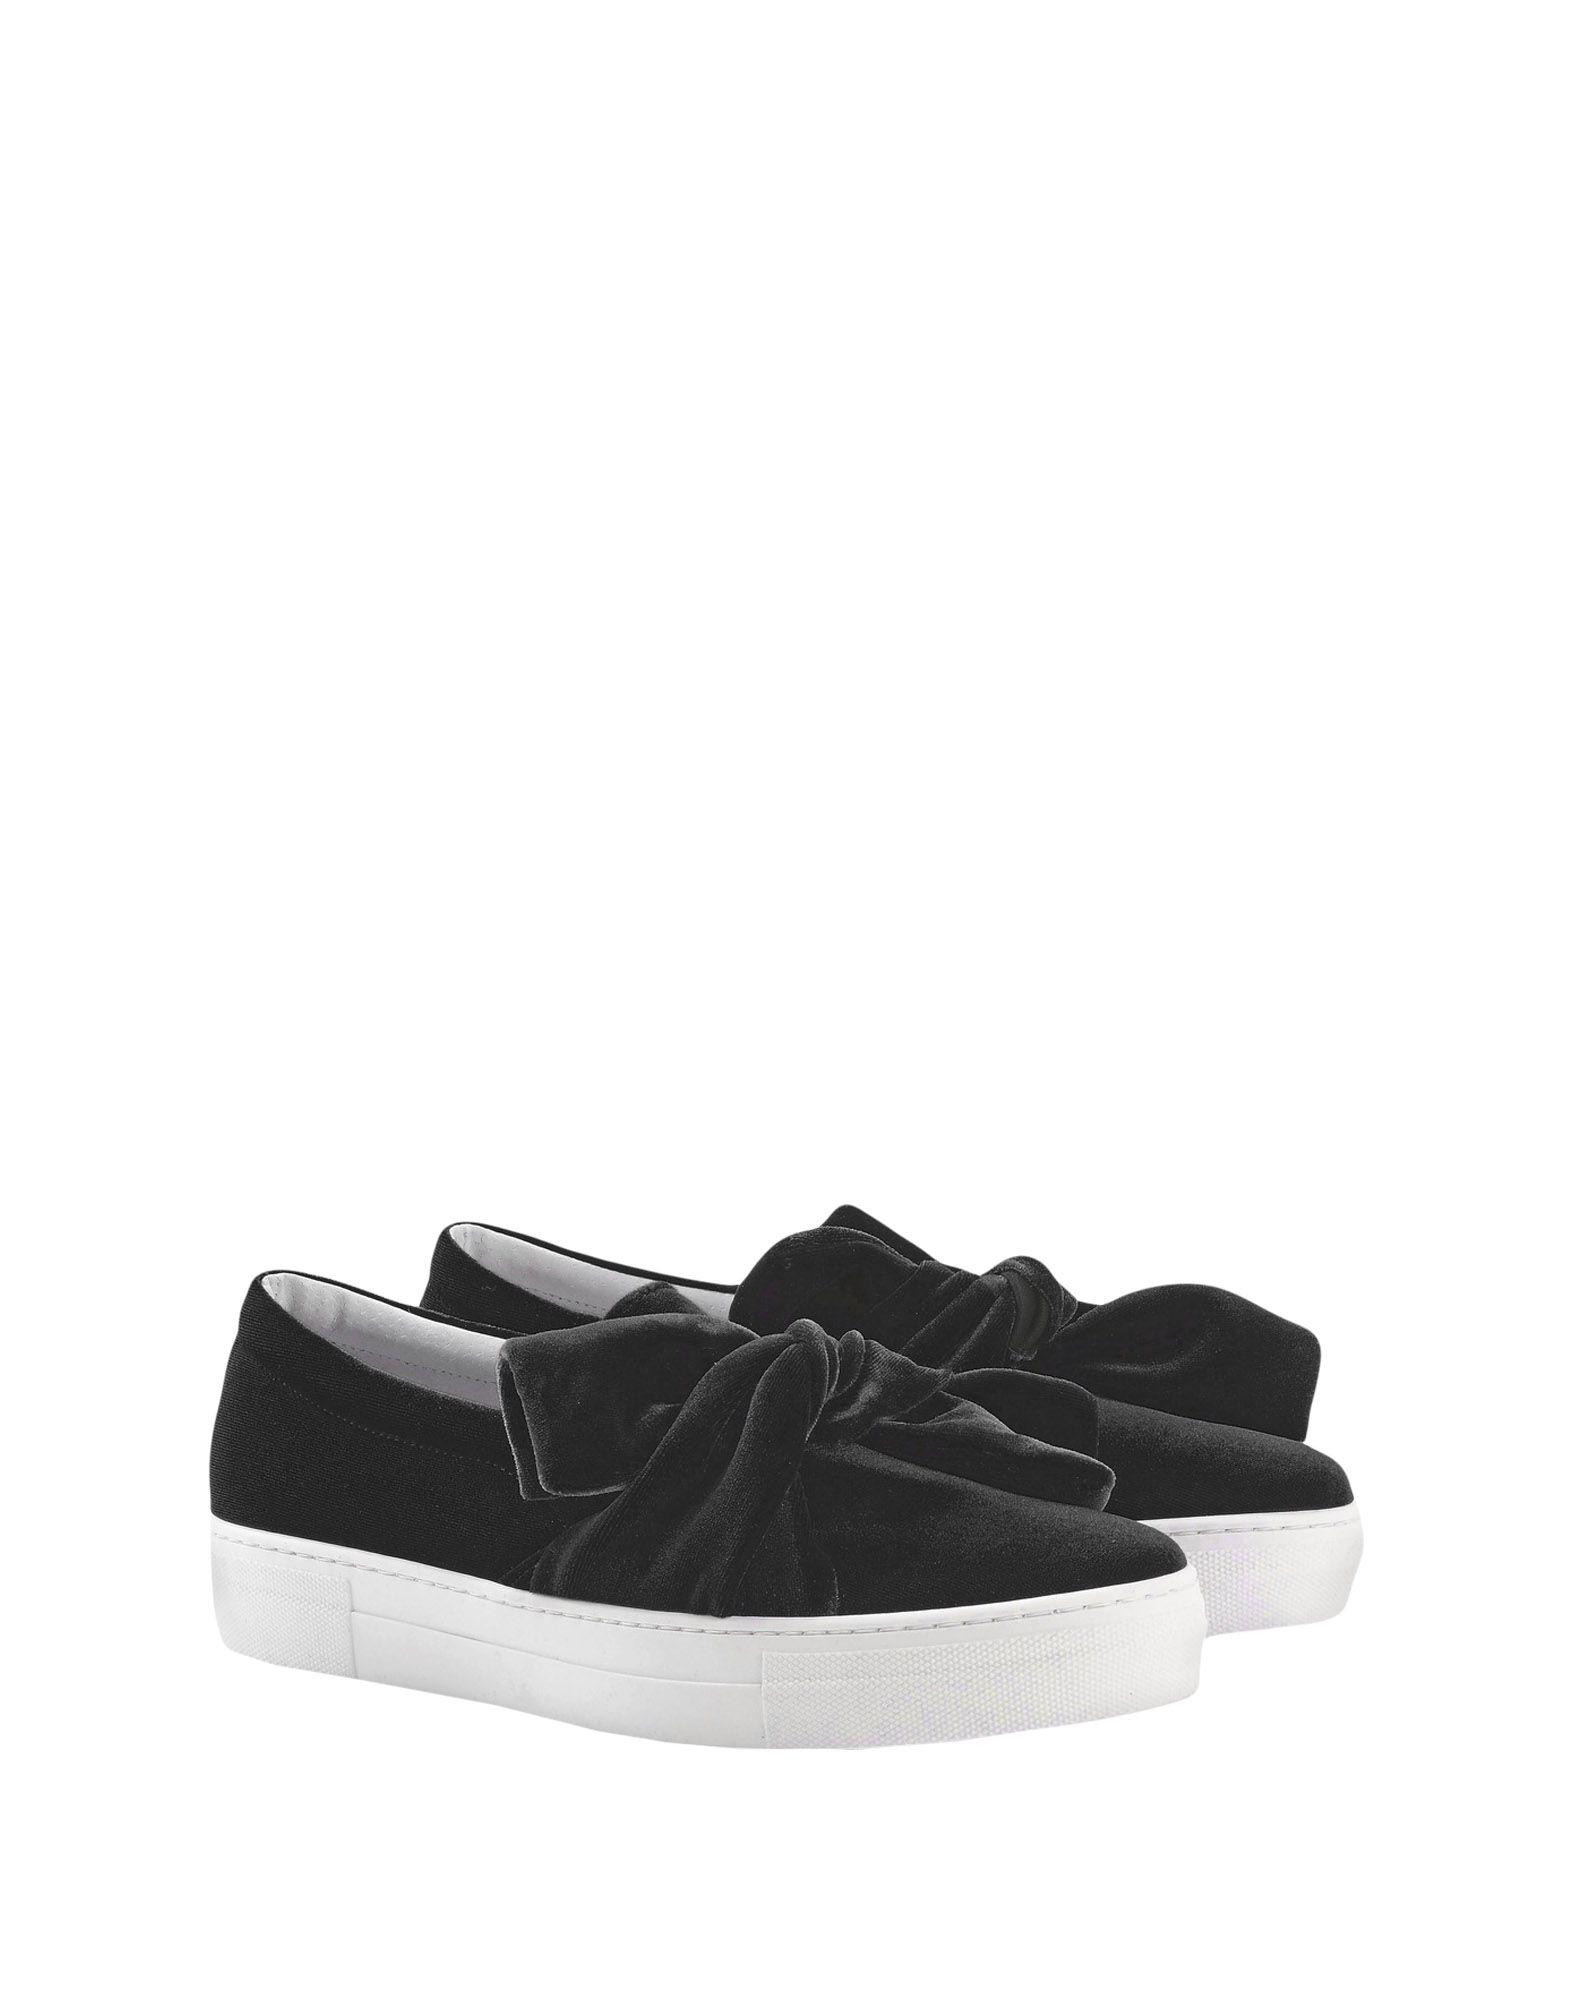 George J. Love Neue Sneakers Damen  11403653VQ Neue Love Schuhe d34621